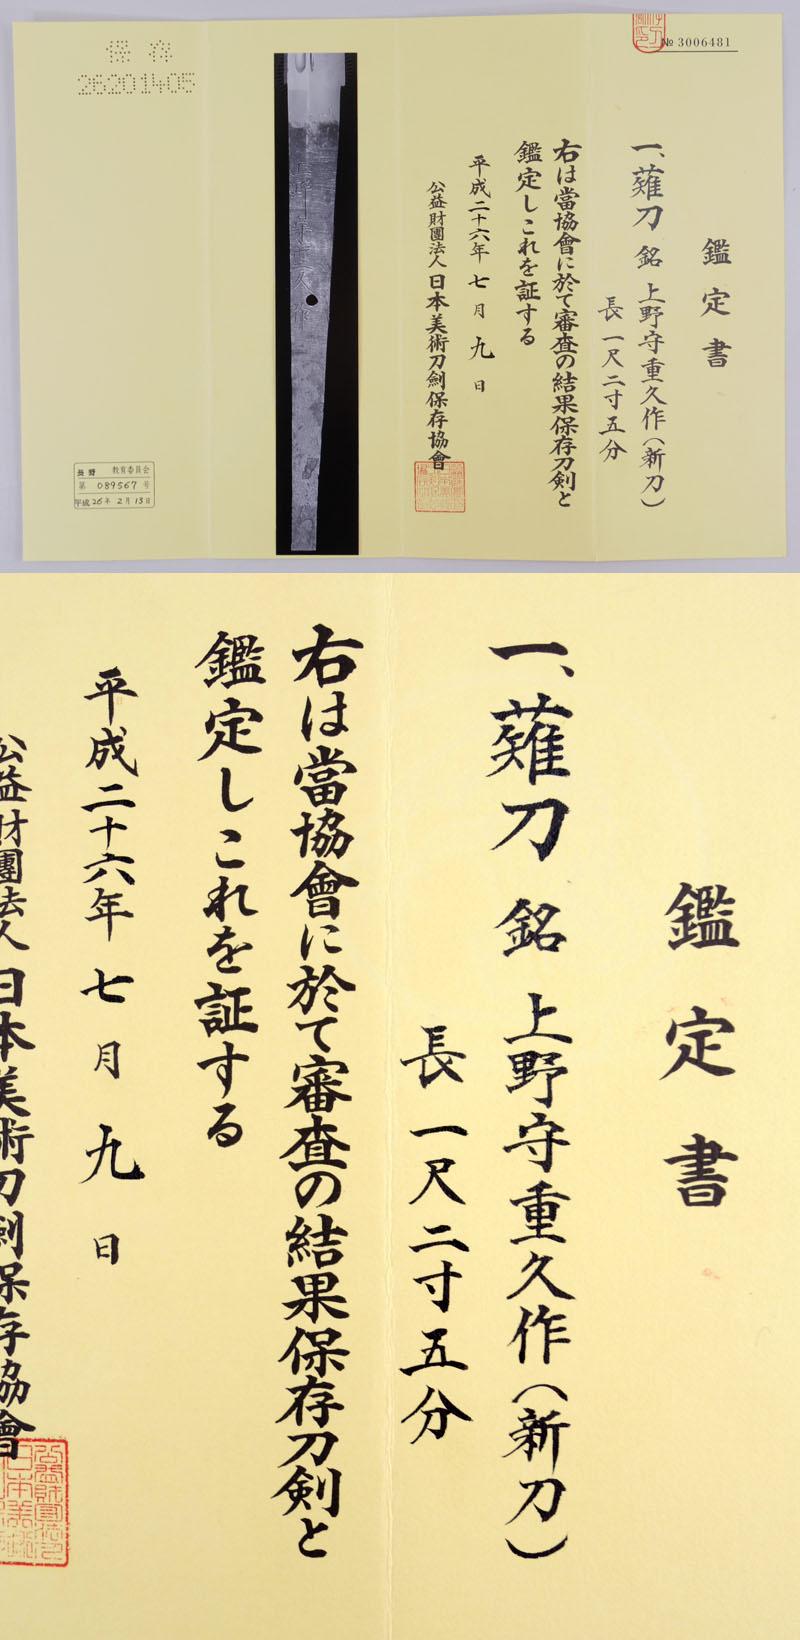 上野守重久作 Picture of Certificate